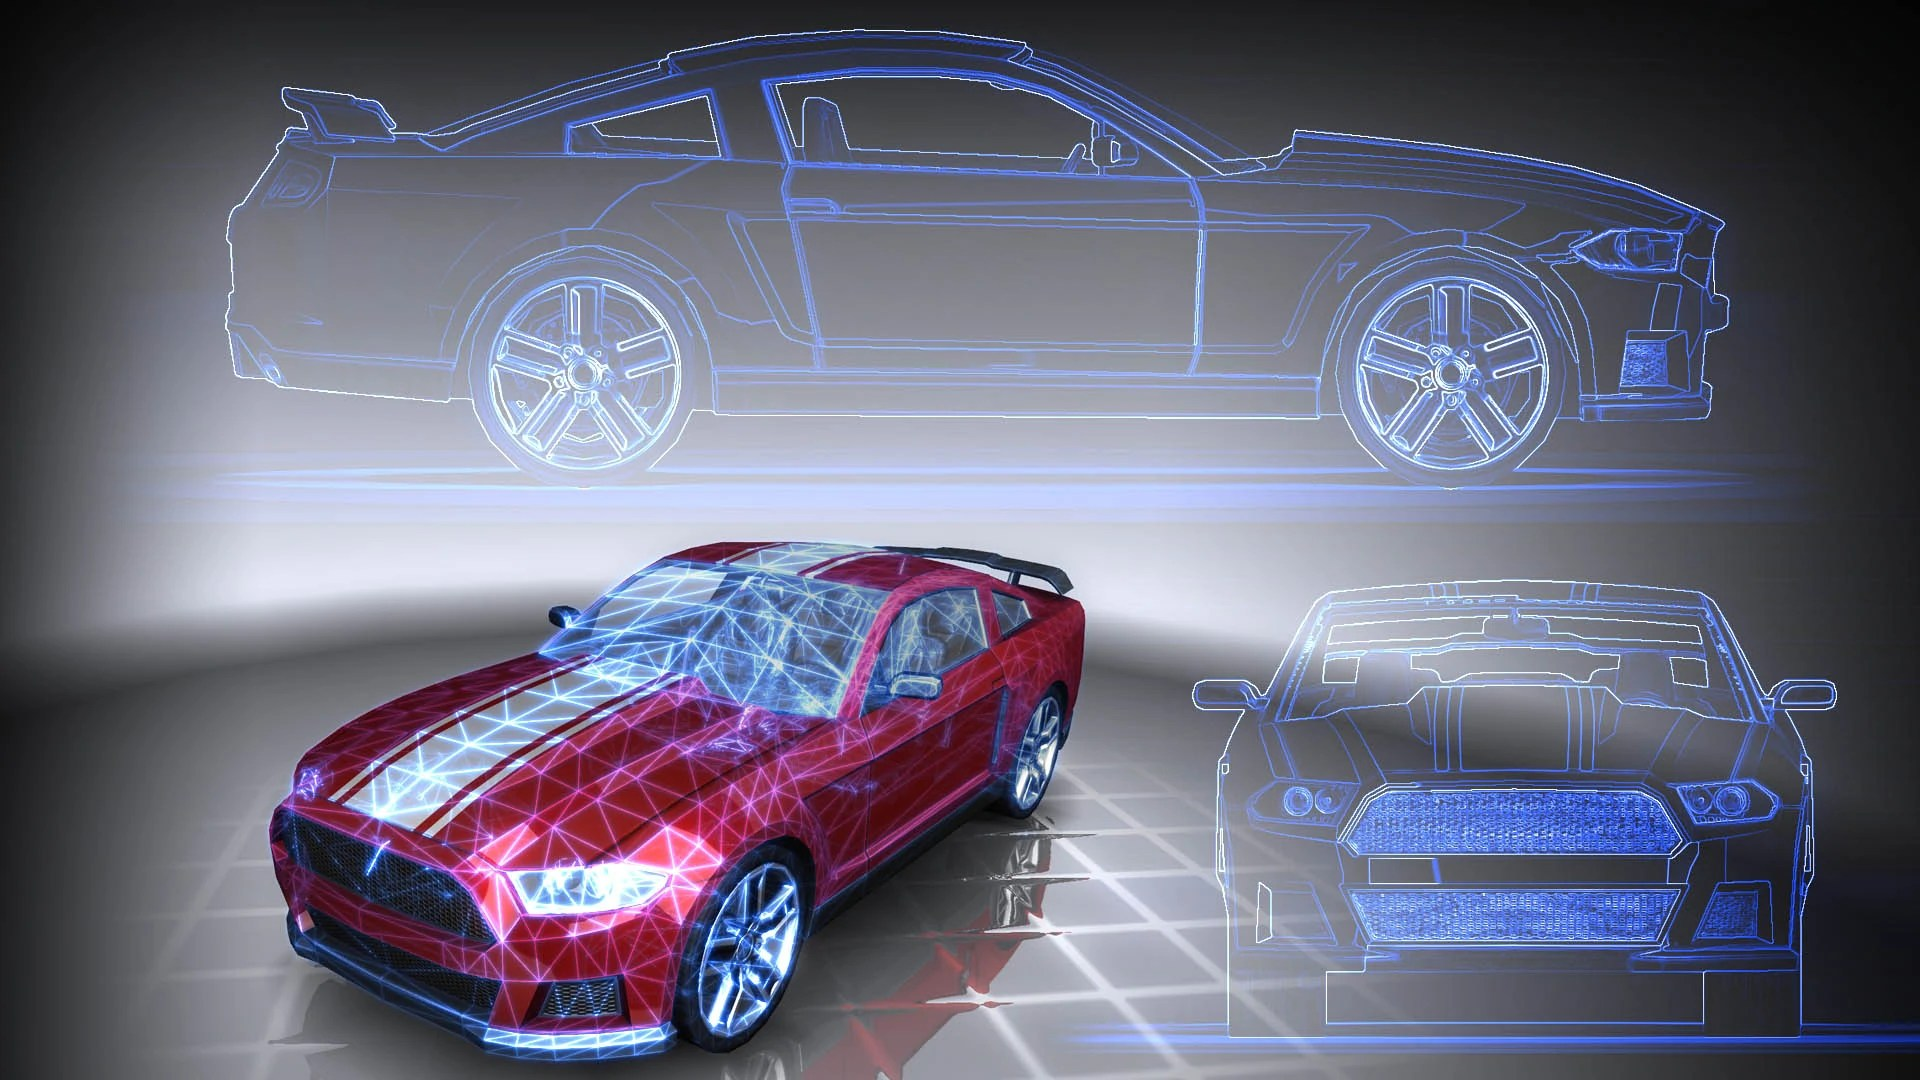 Wallpaper Engine Car Blueprints Steam Trading Cards Wiki FANDOM Powered By Wikia